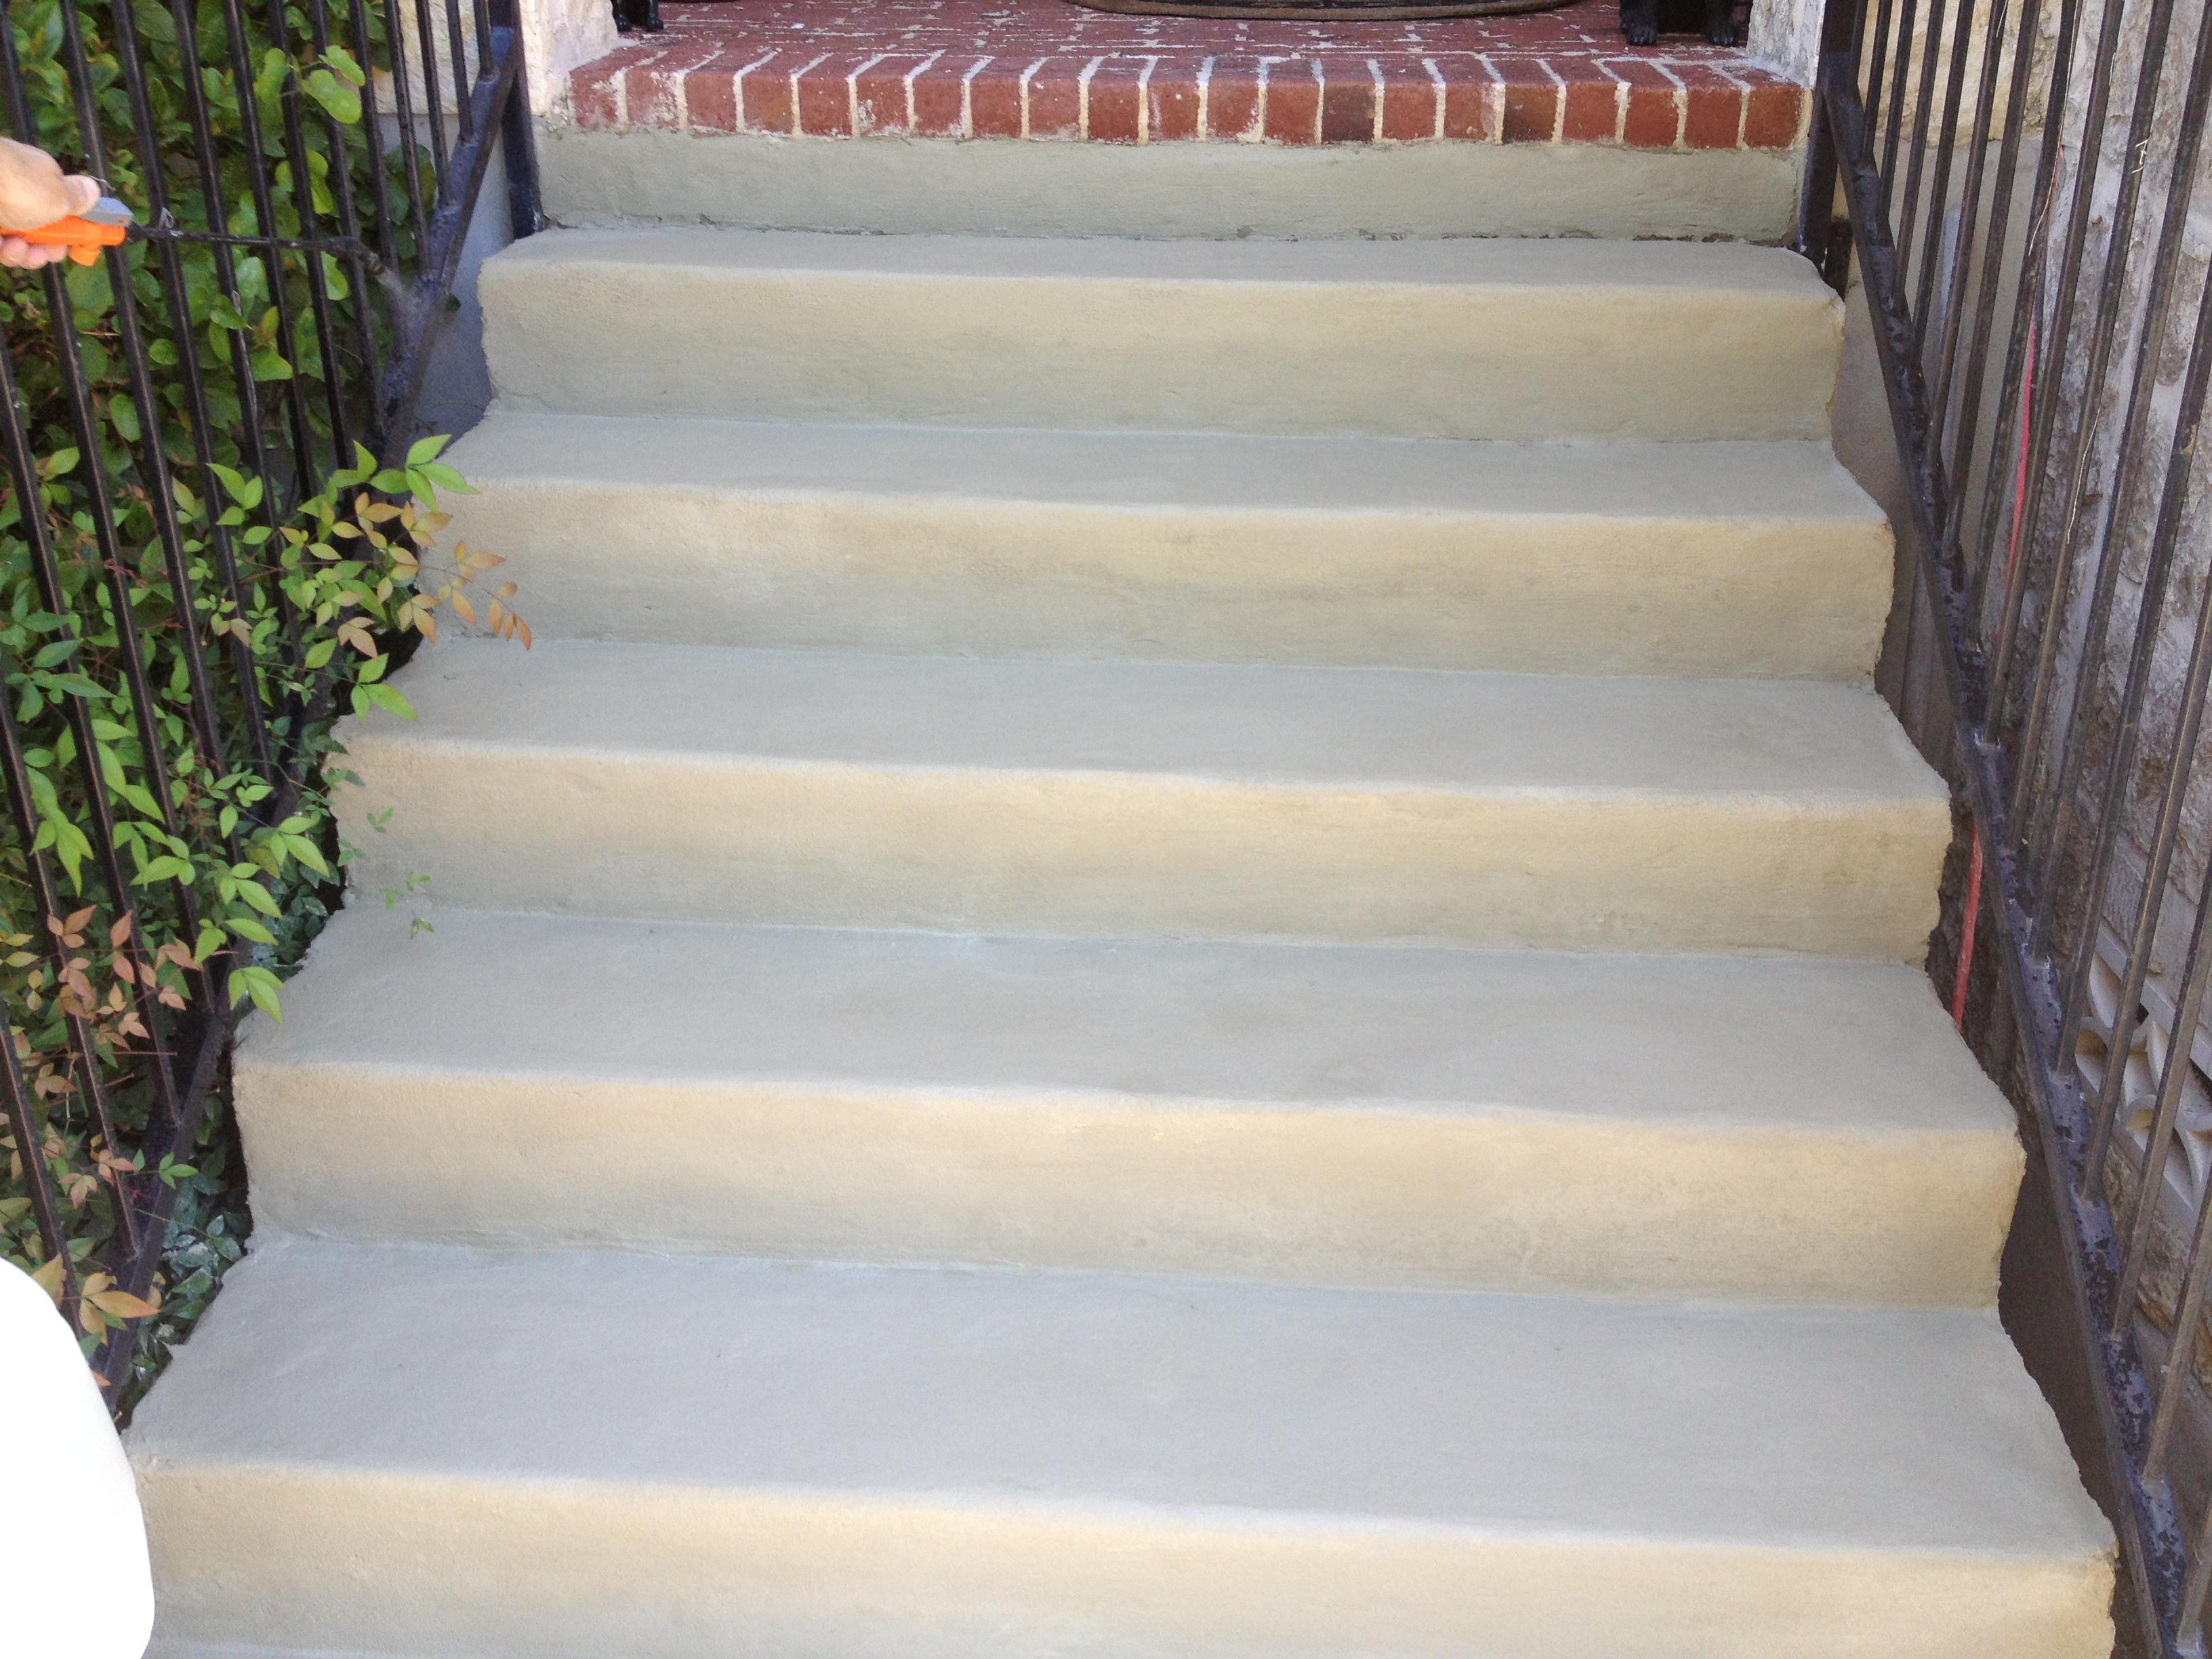 Resurfacing concrete mvl concretes 39 blog - Resurfacing exterior concrete stairs ...